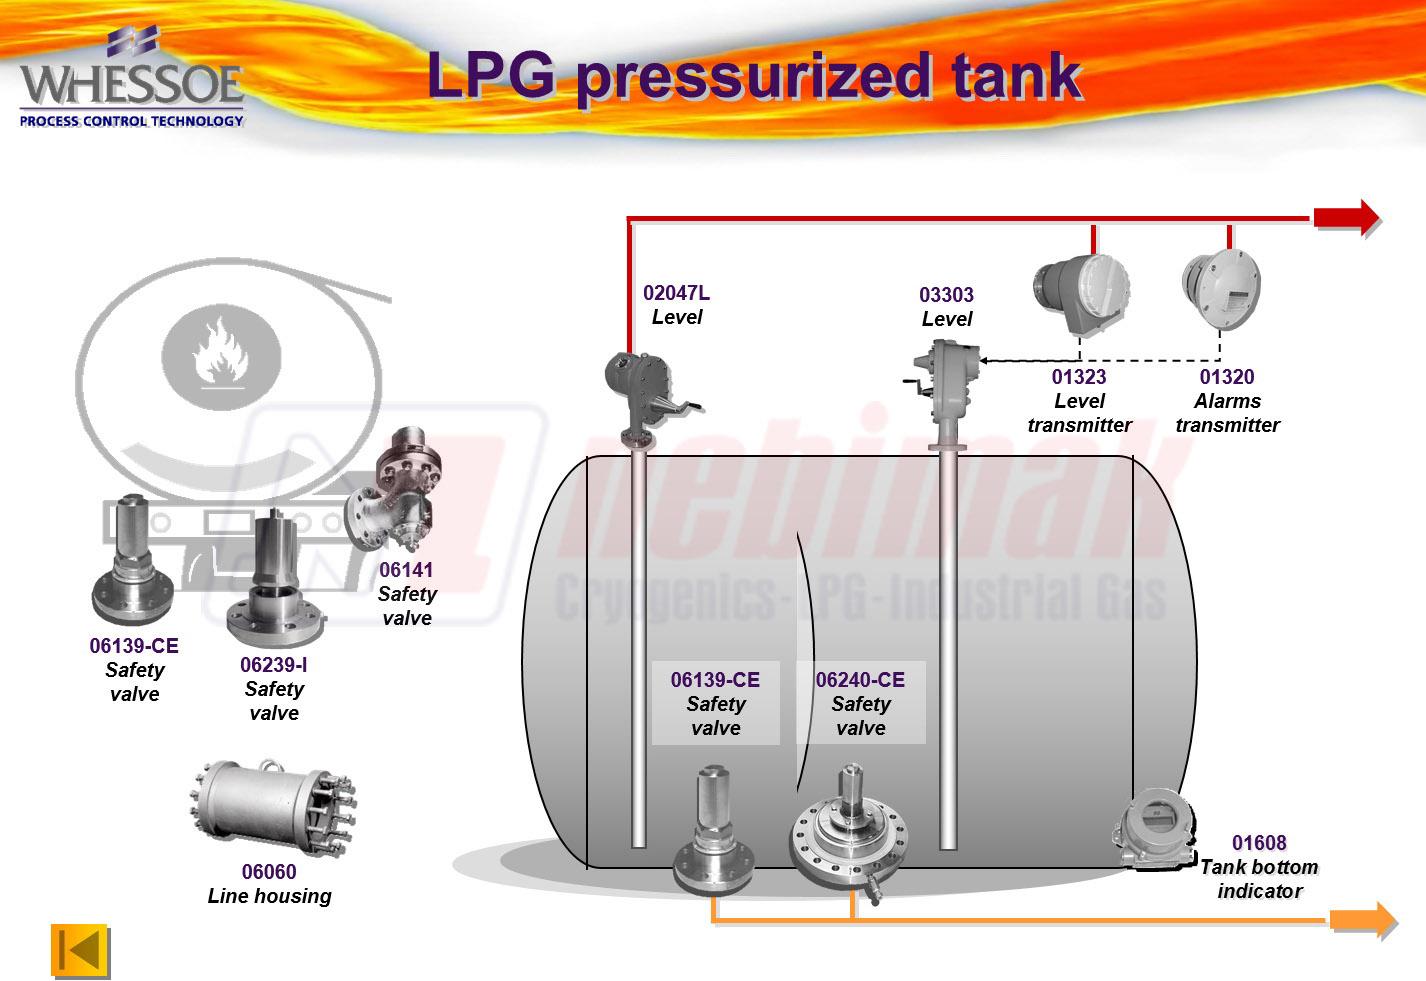 LPG Pressurized